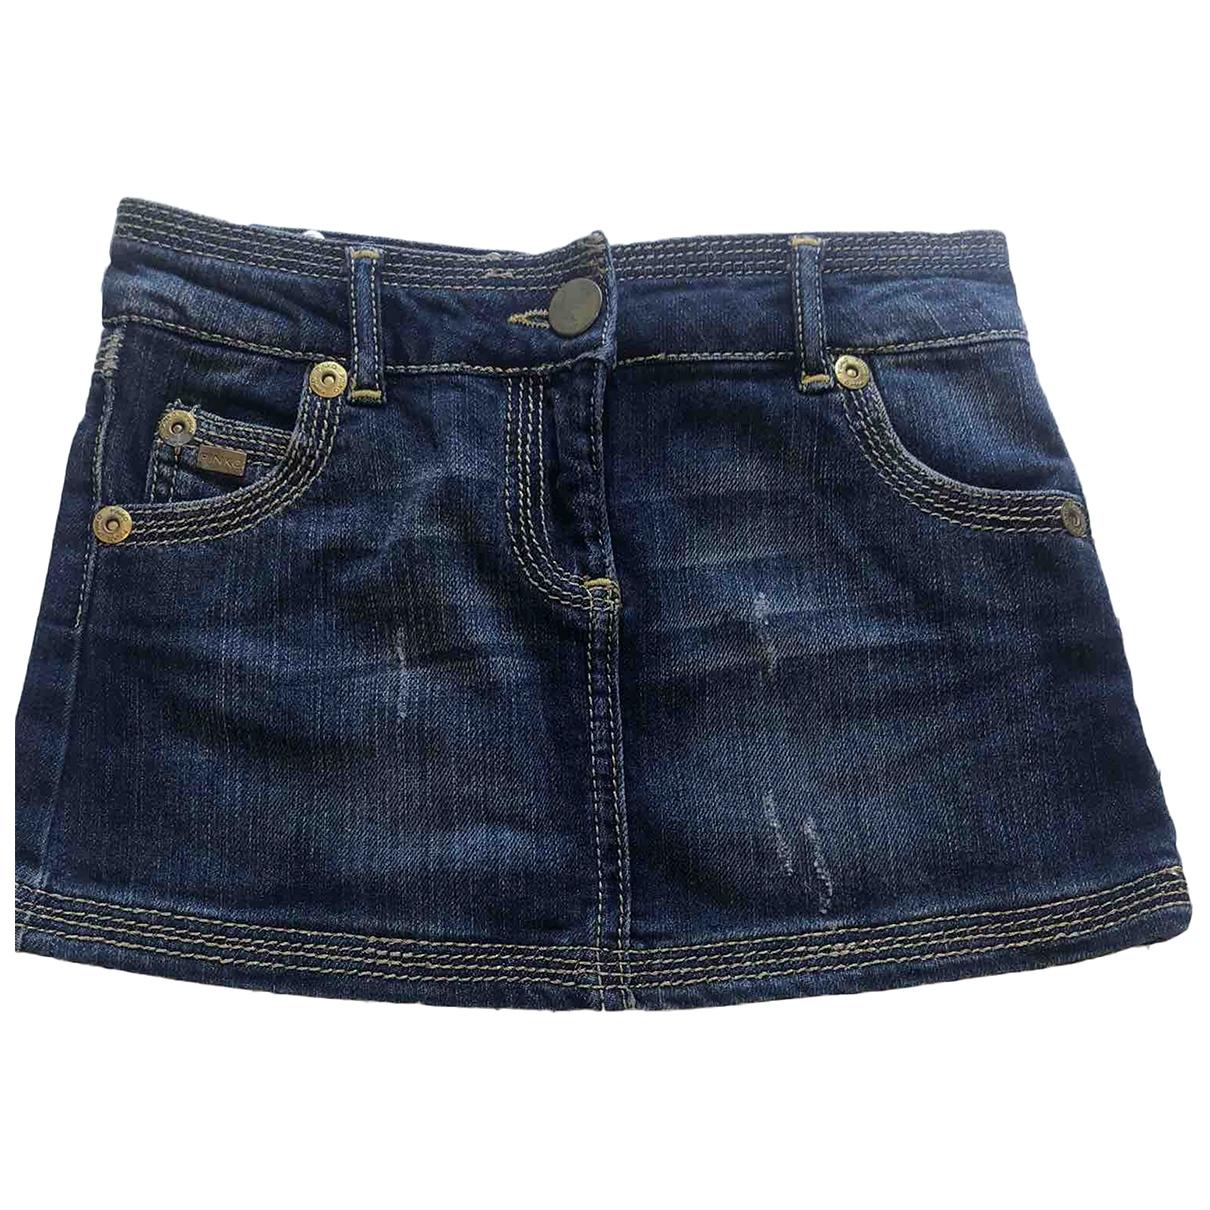 Pinko \N Blue Denim - Jeans skirt for Kids 8 years - up to 128cm FR